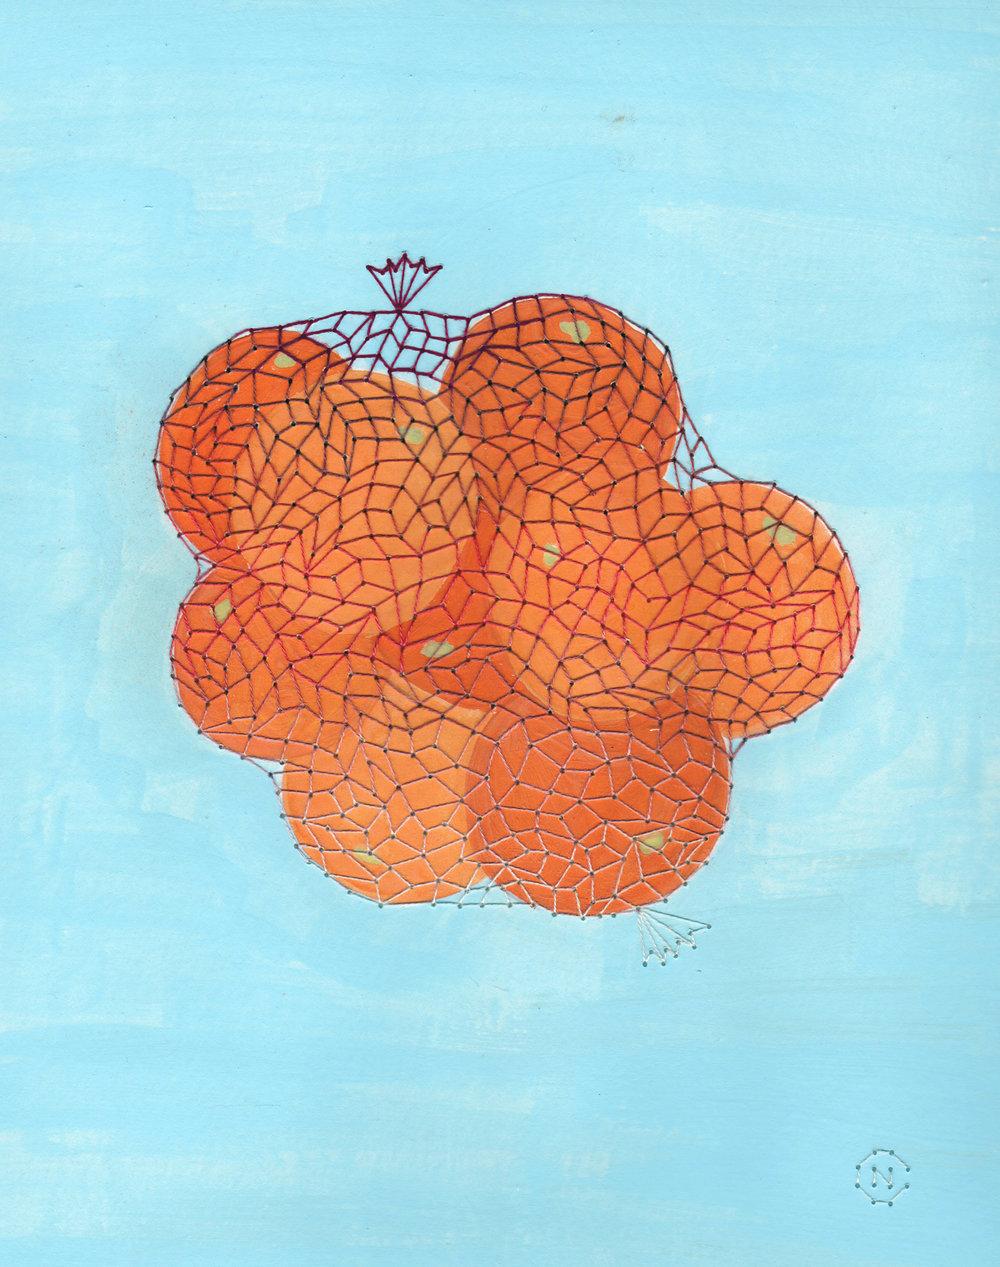 Oranges in Net